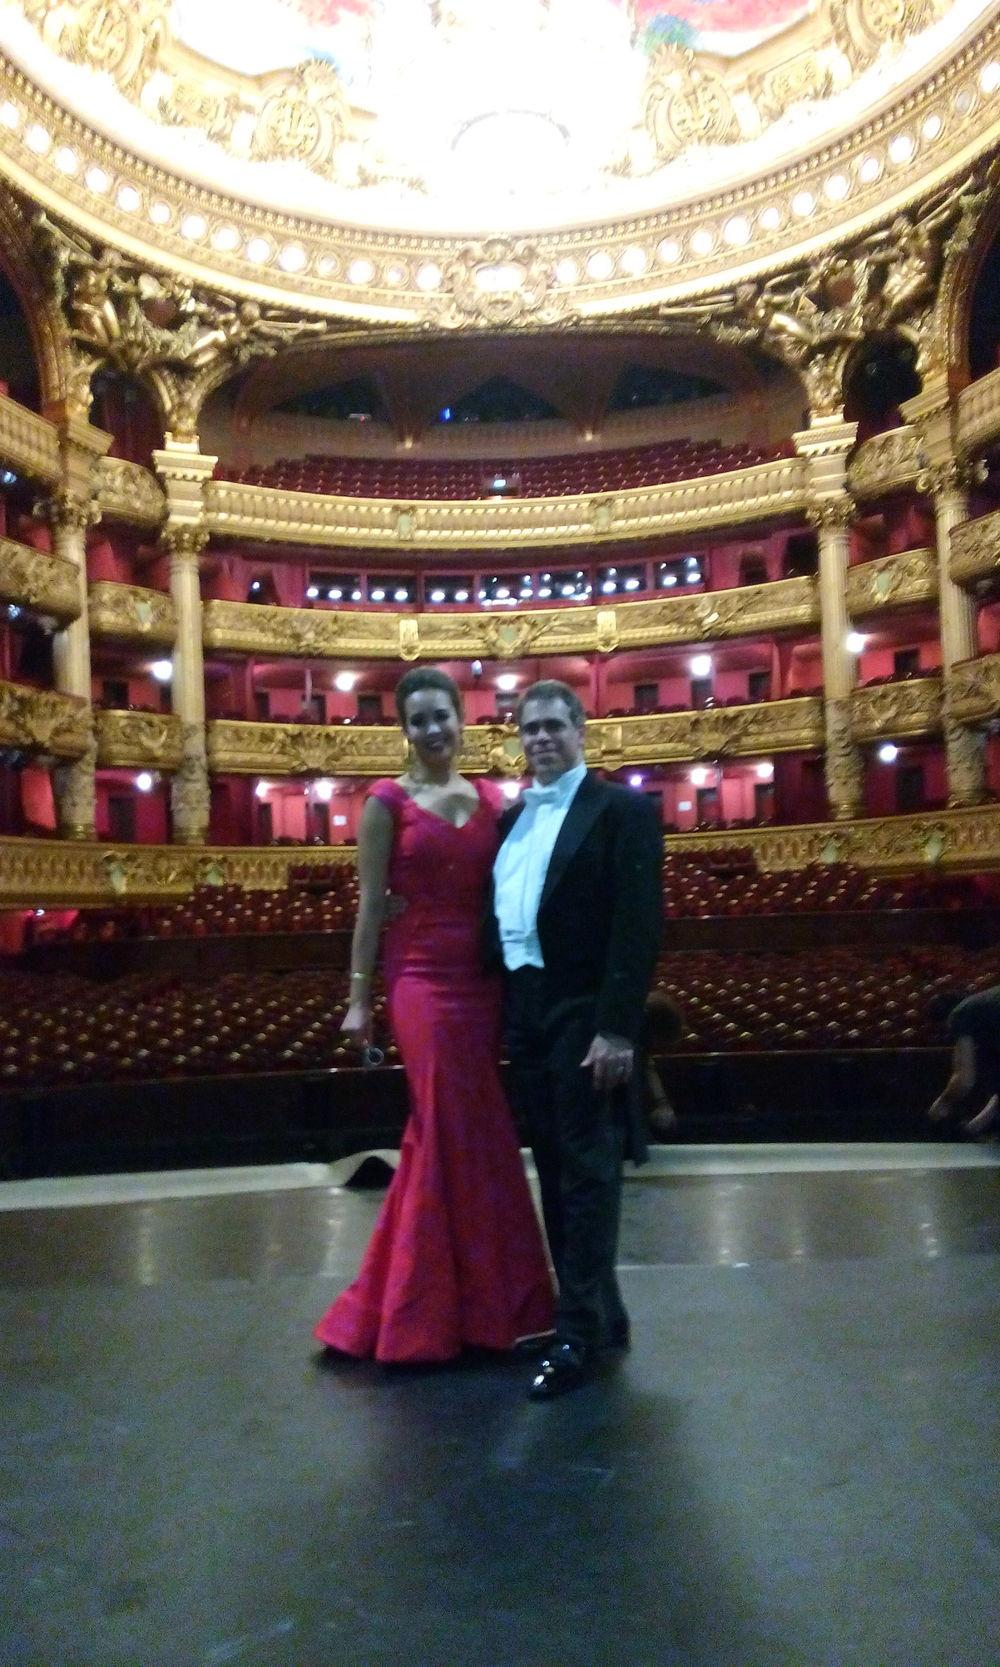 Nadine Sierra - Palais Garnier Recital